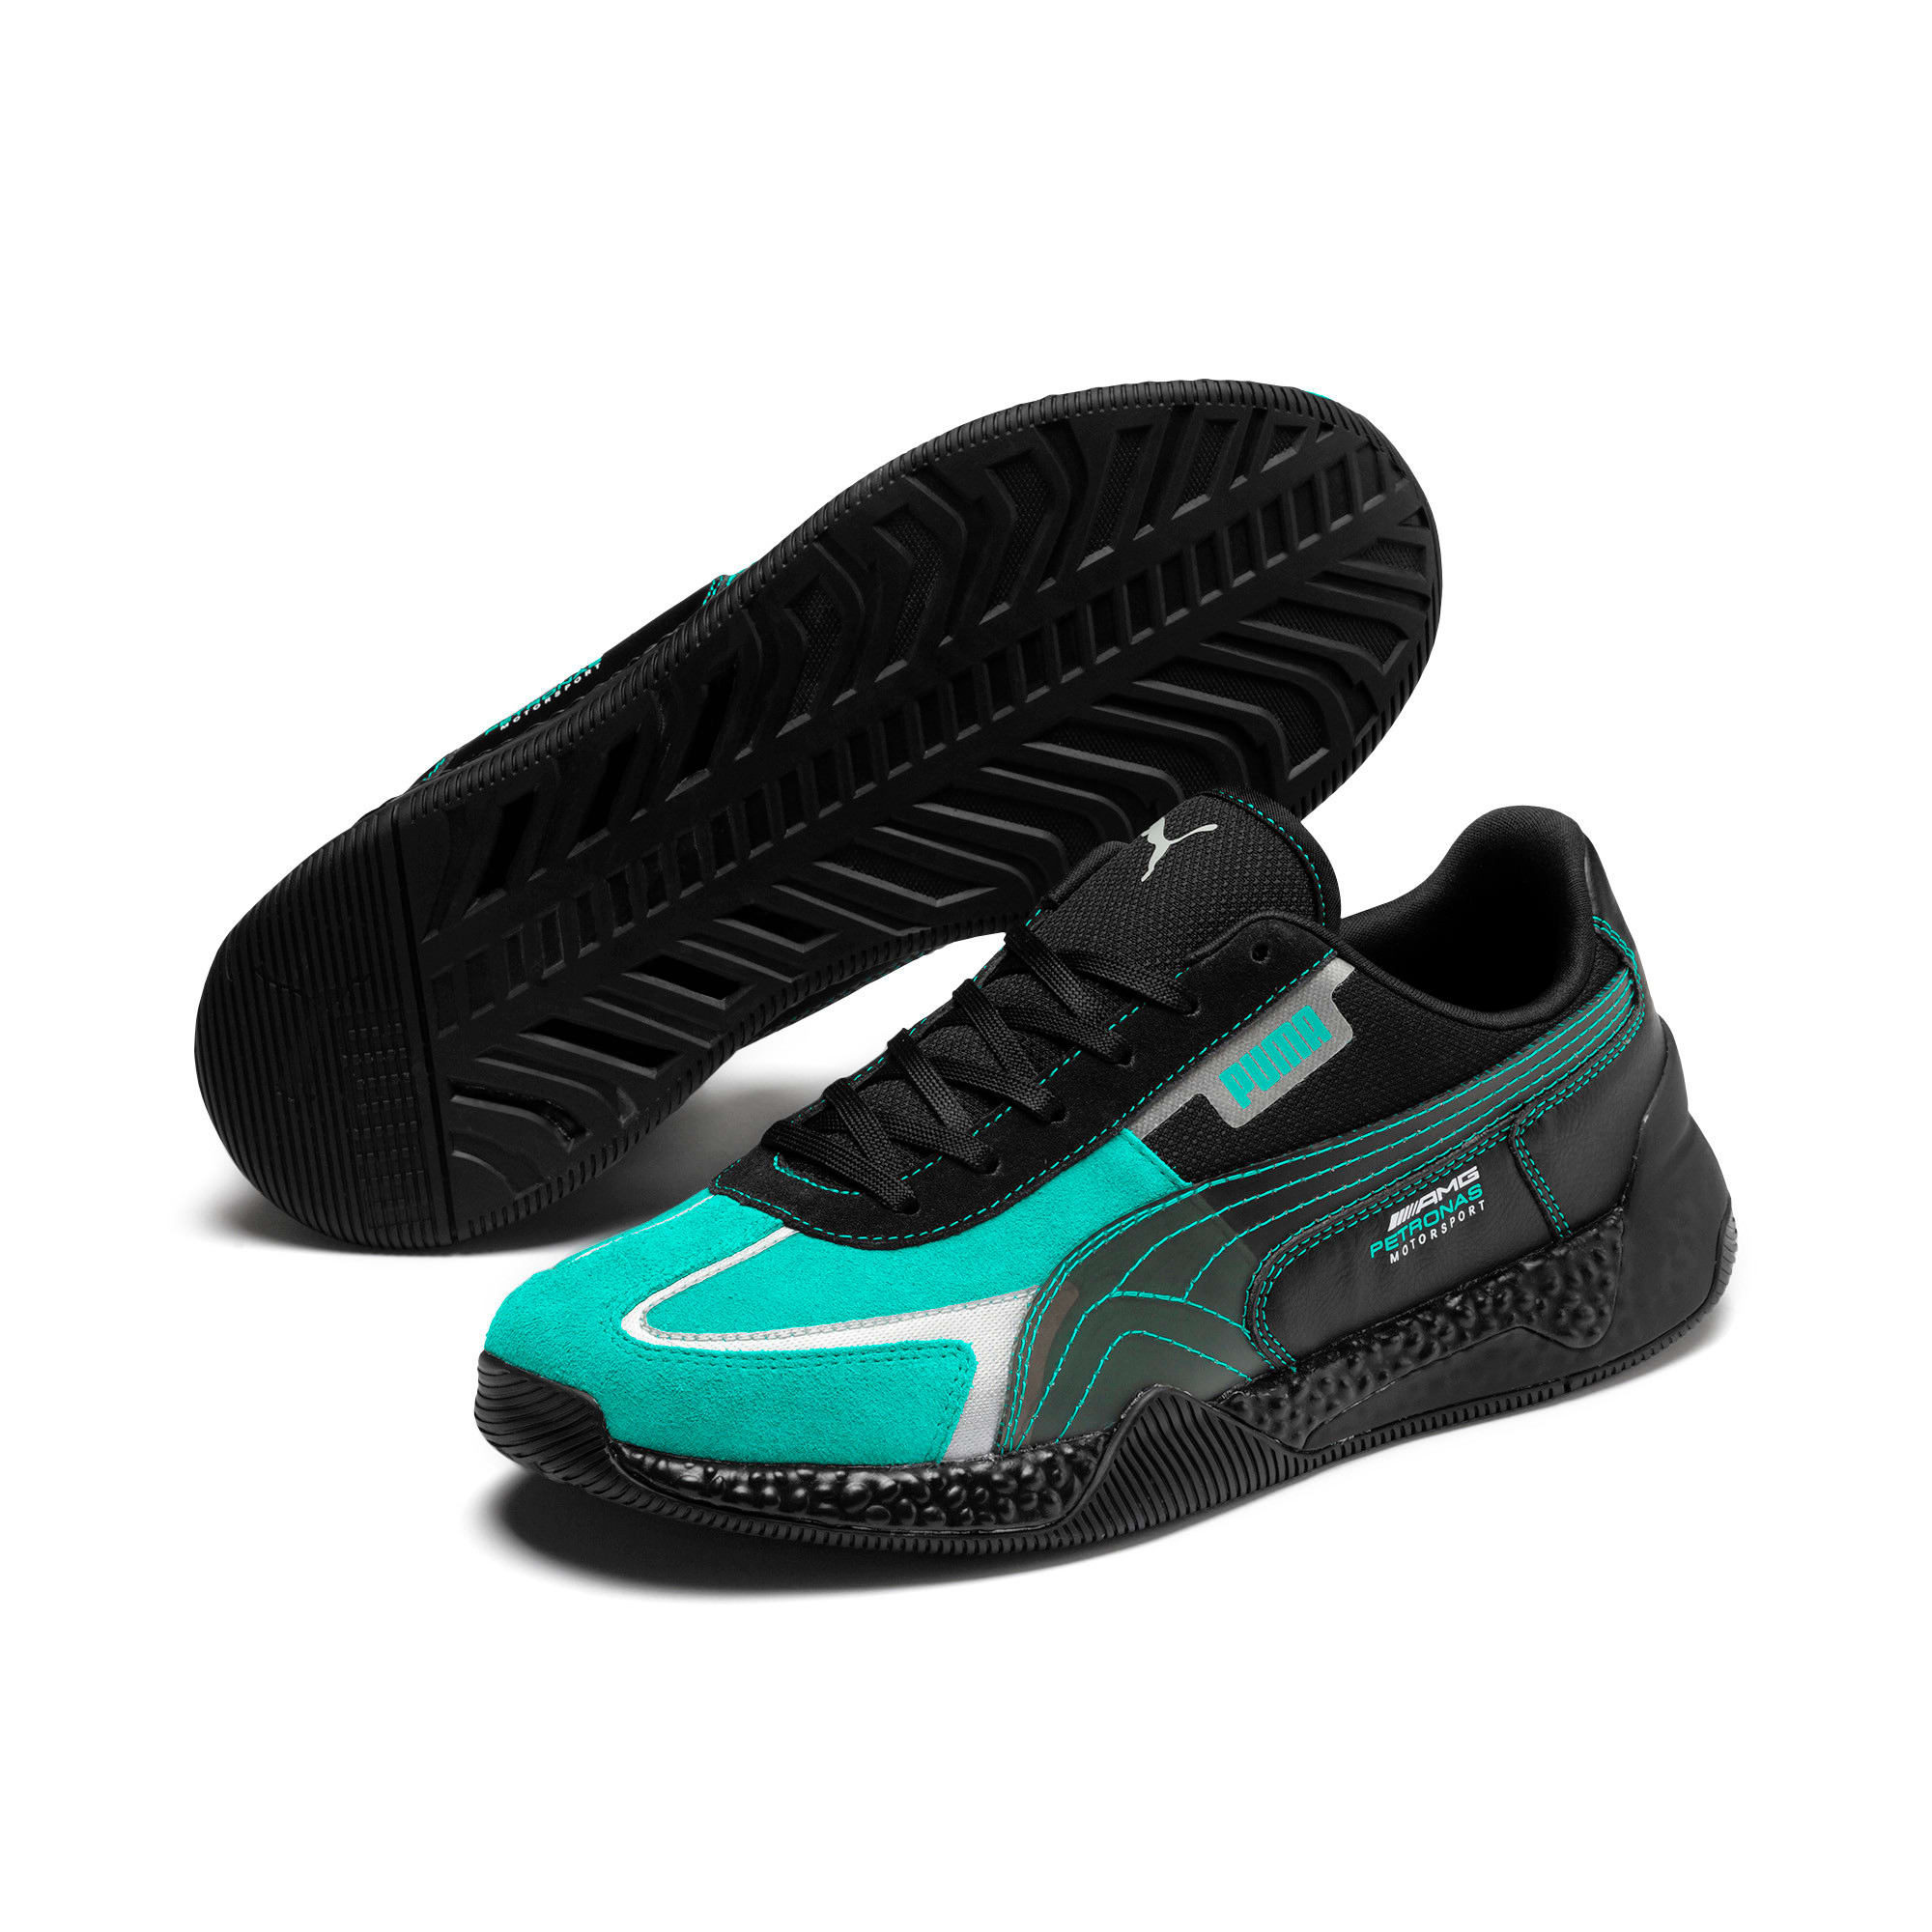 Thumbnail 3 of Mercedes AMG Petronas Motorsport Speed HYBRID Men's Trainers, Puma Black-Spectra Green, medium